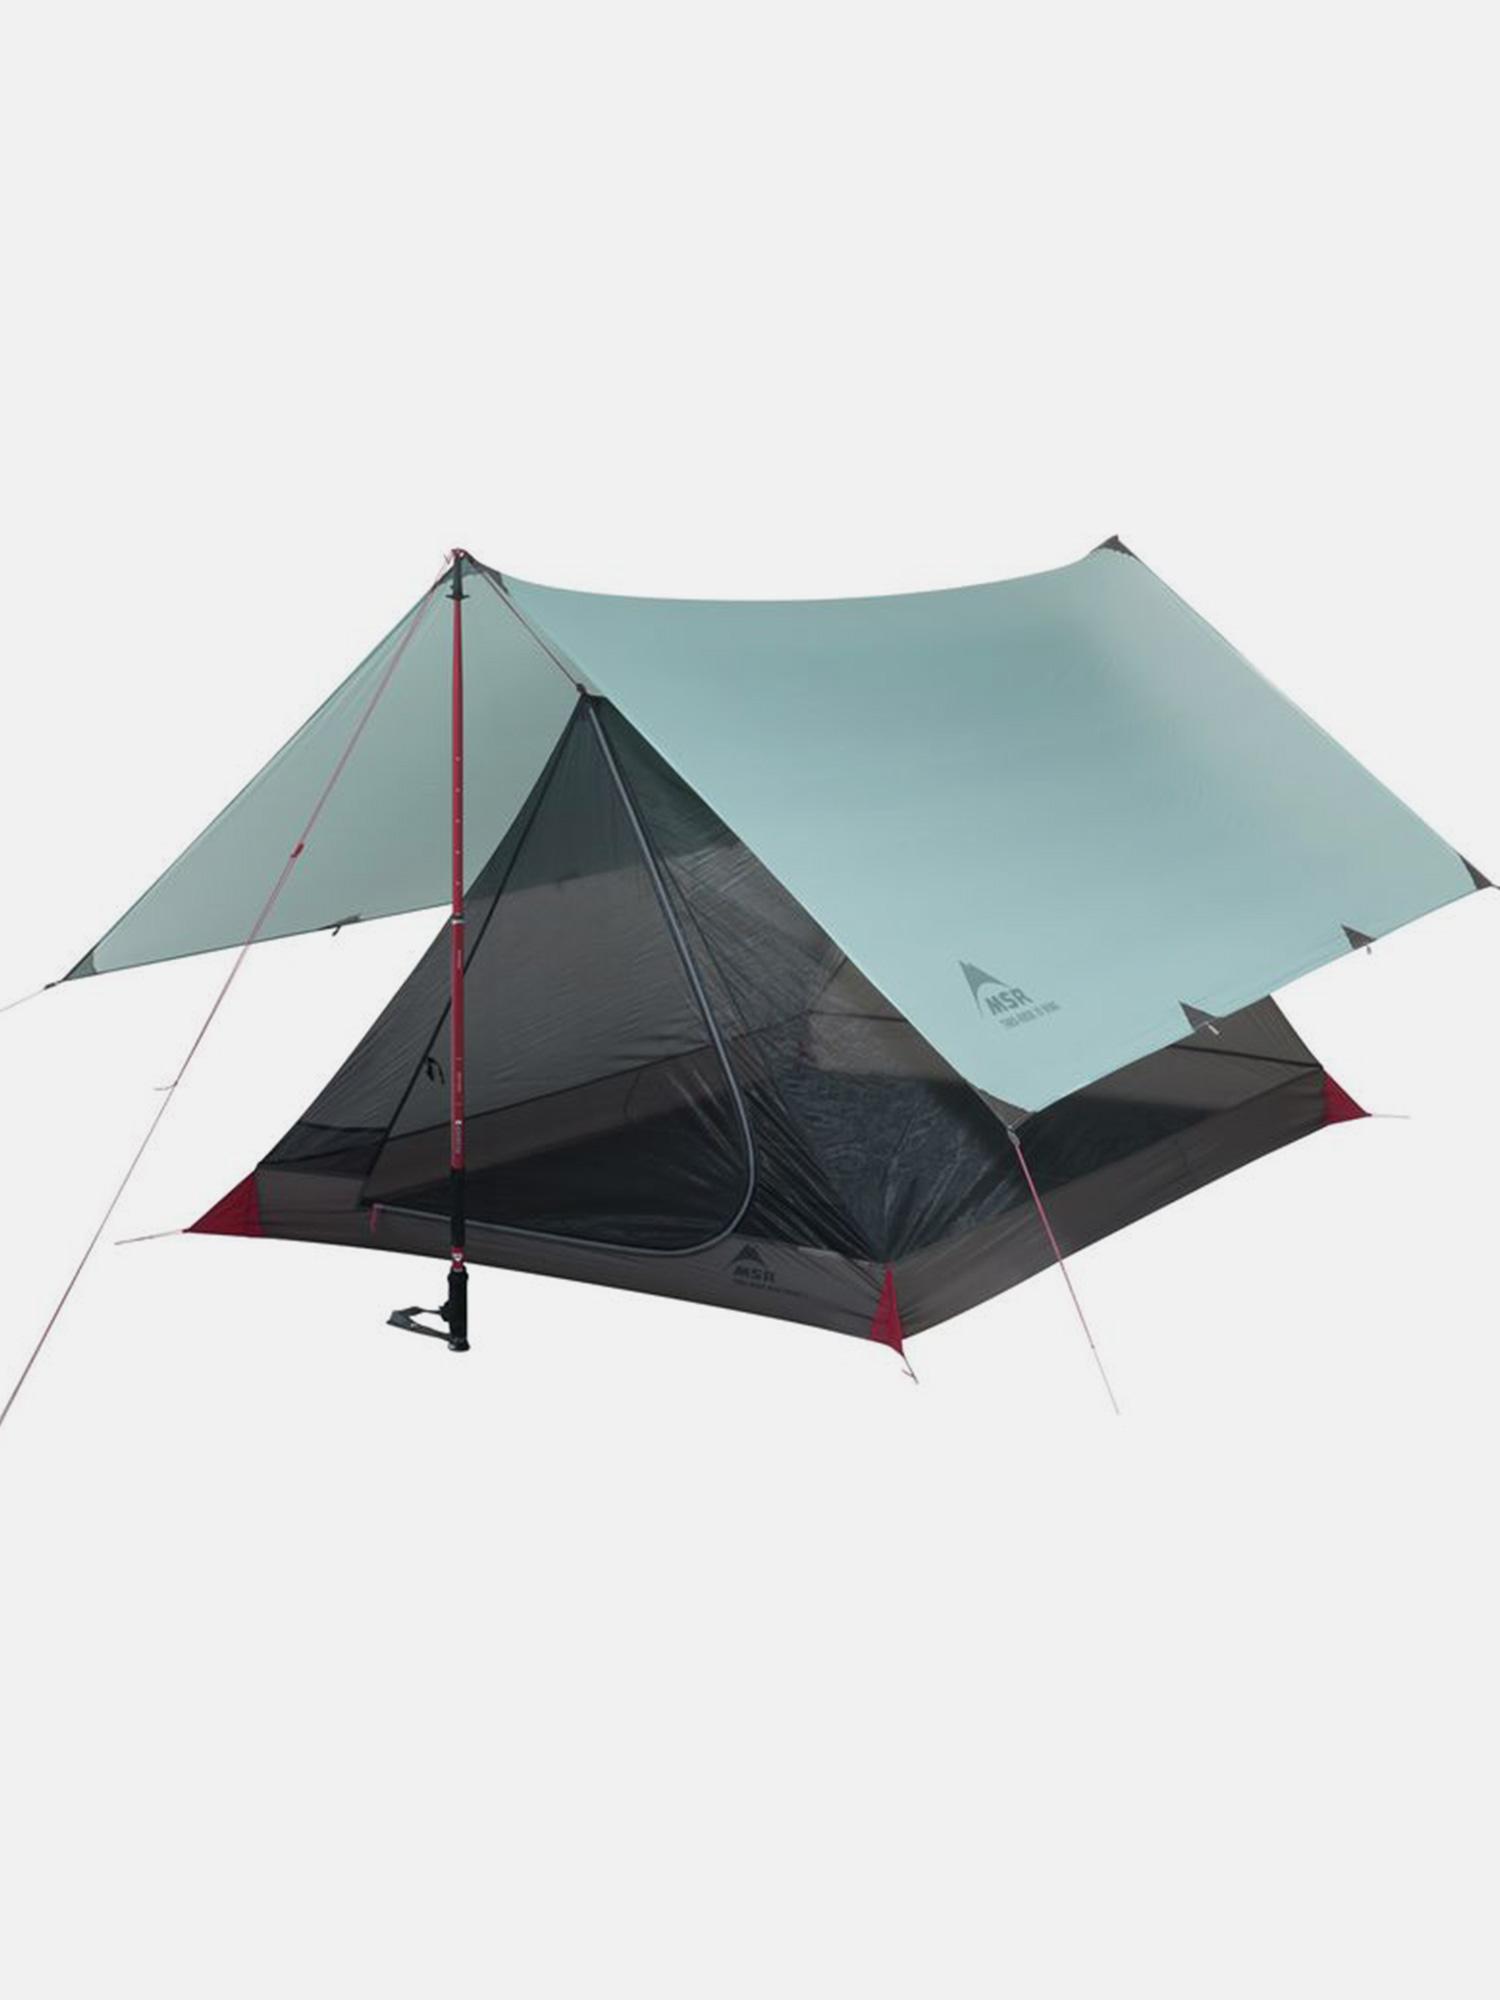 MSR Lightweight Backpacking Tent - $199.95